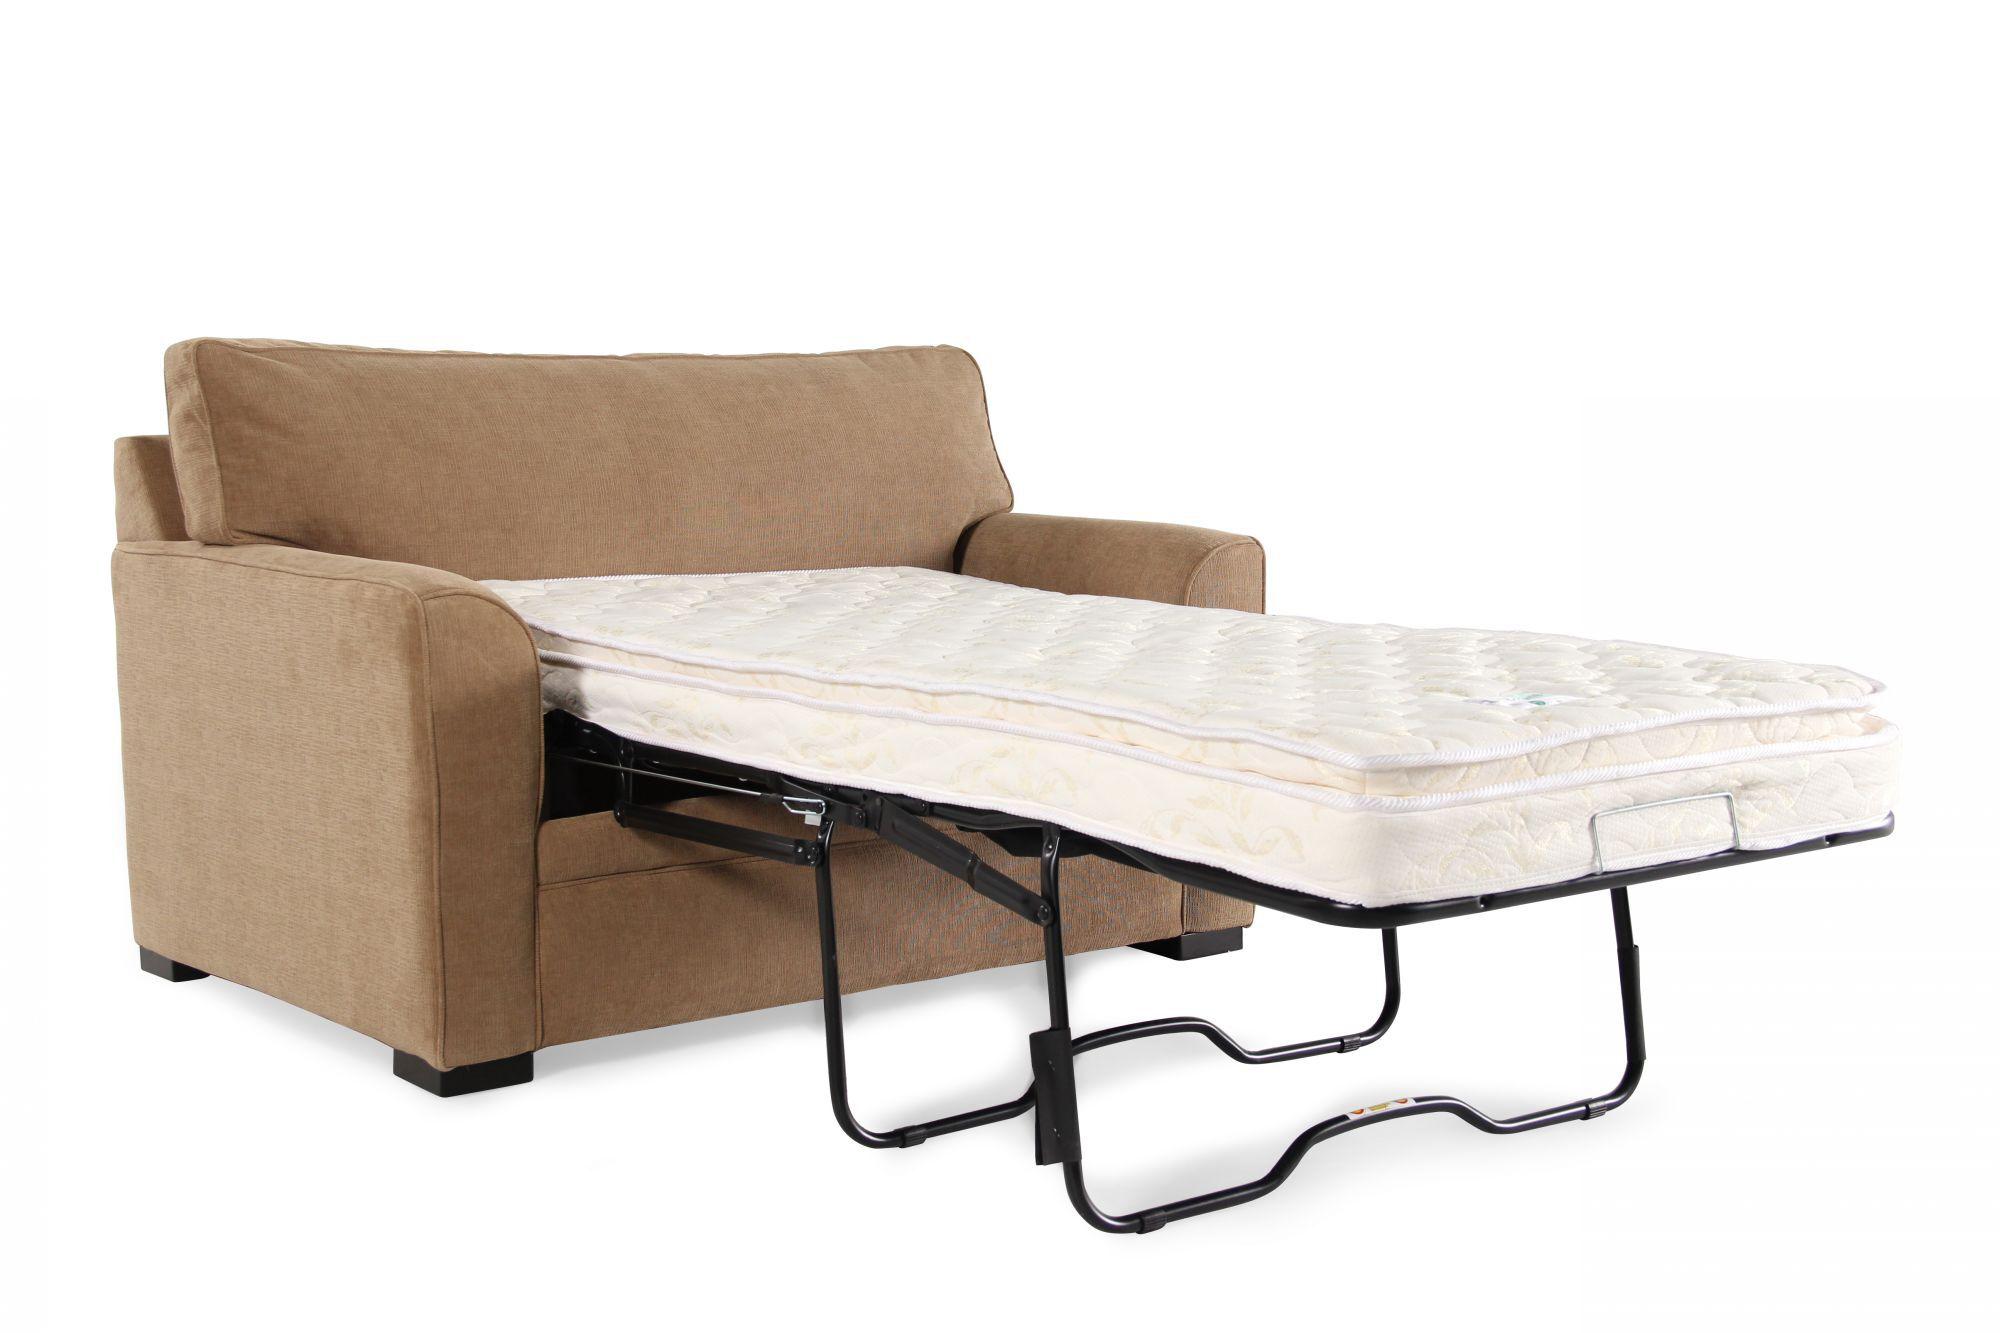 jonathan louis sofa bed lifestyle solutions lexington blissful brown full memory foam sleeper